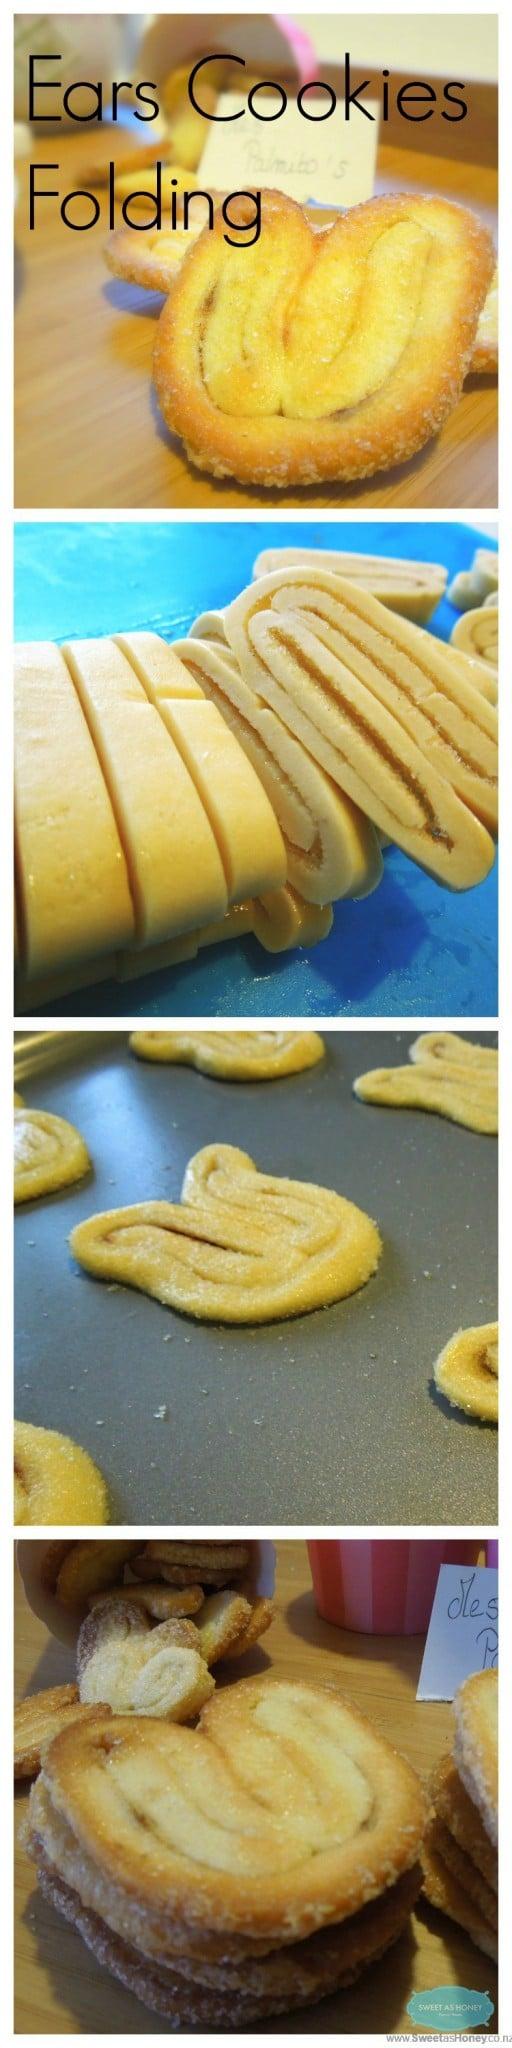 Elephant Ears Cookies folding